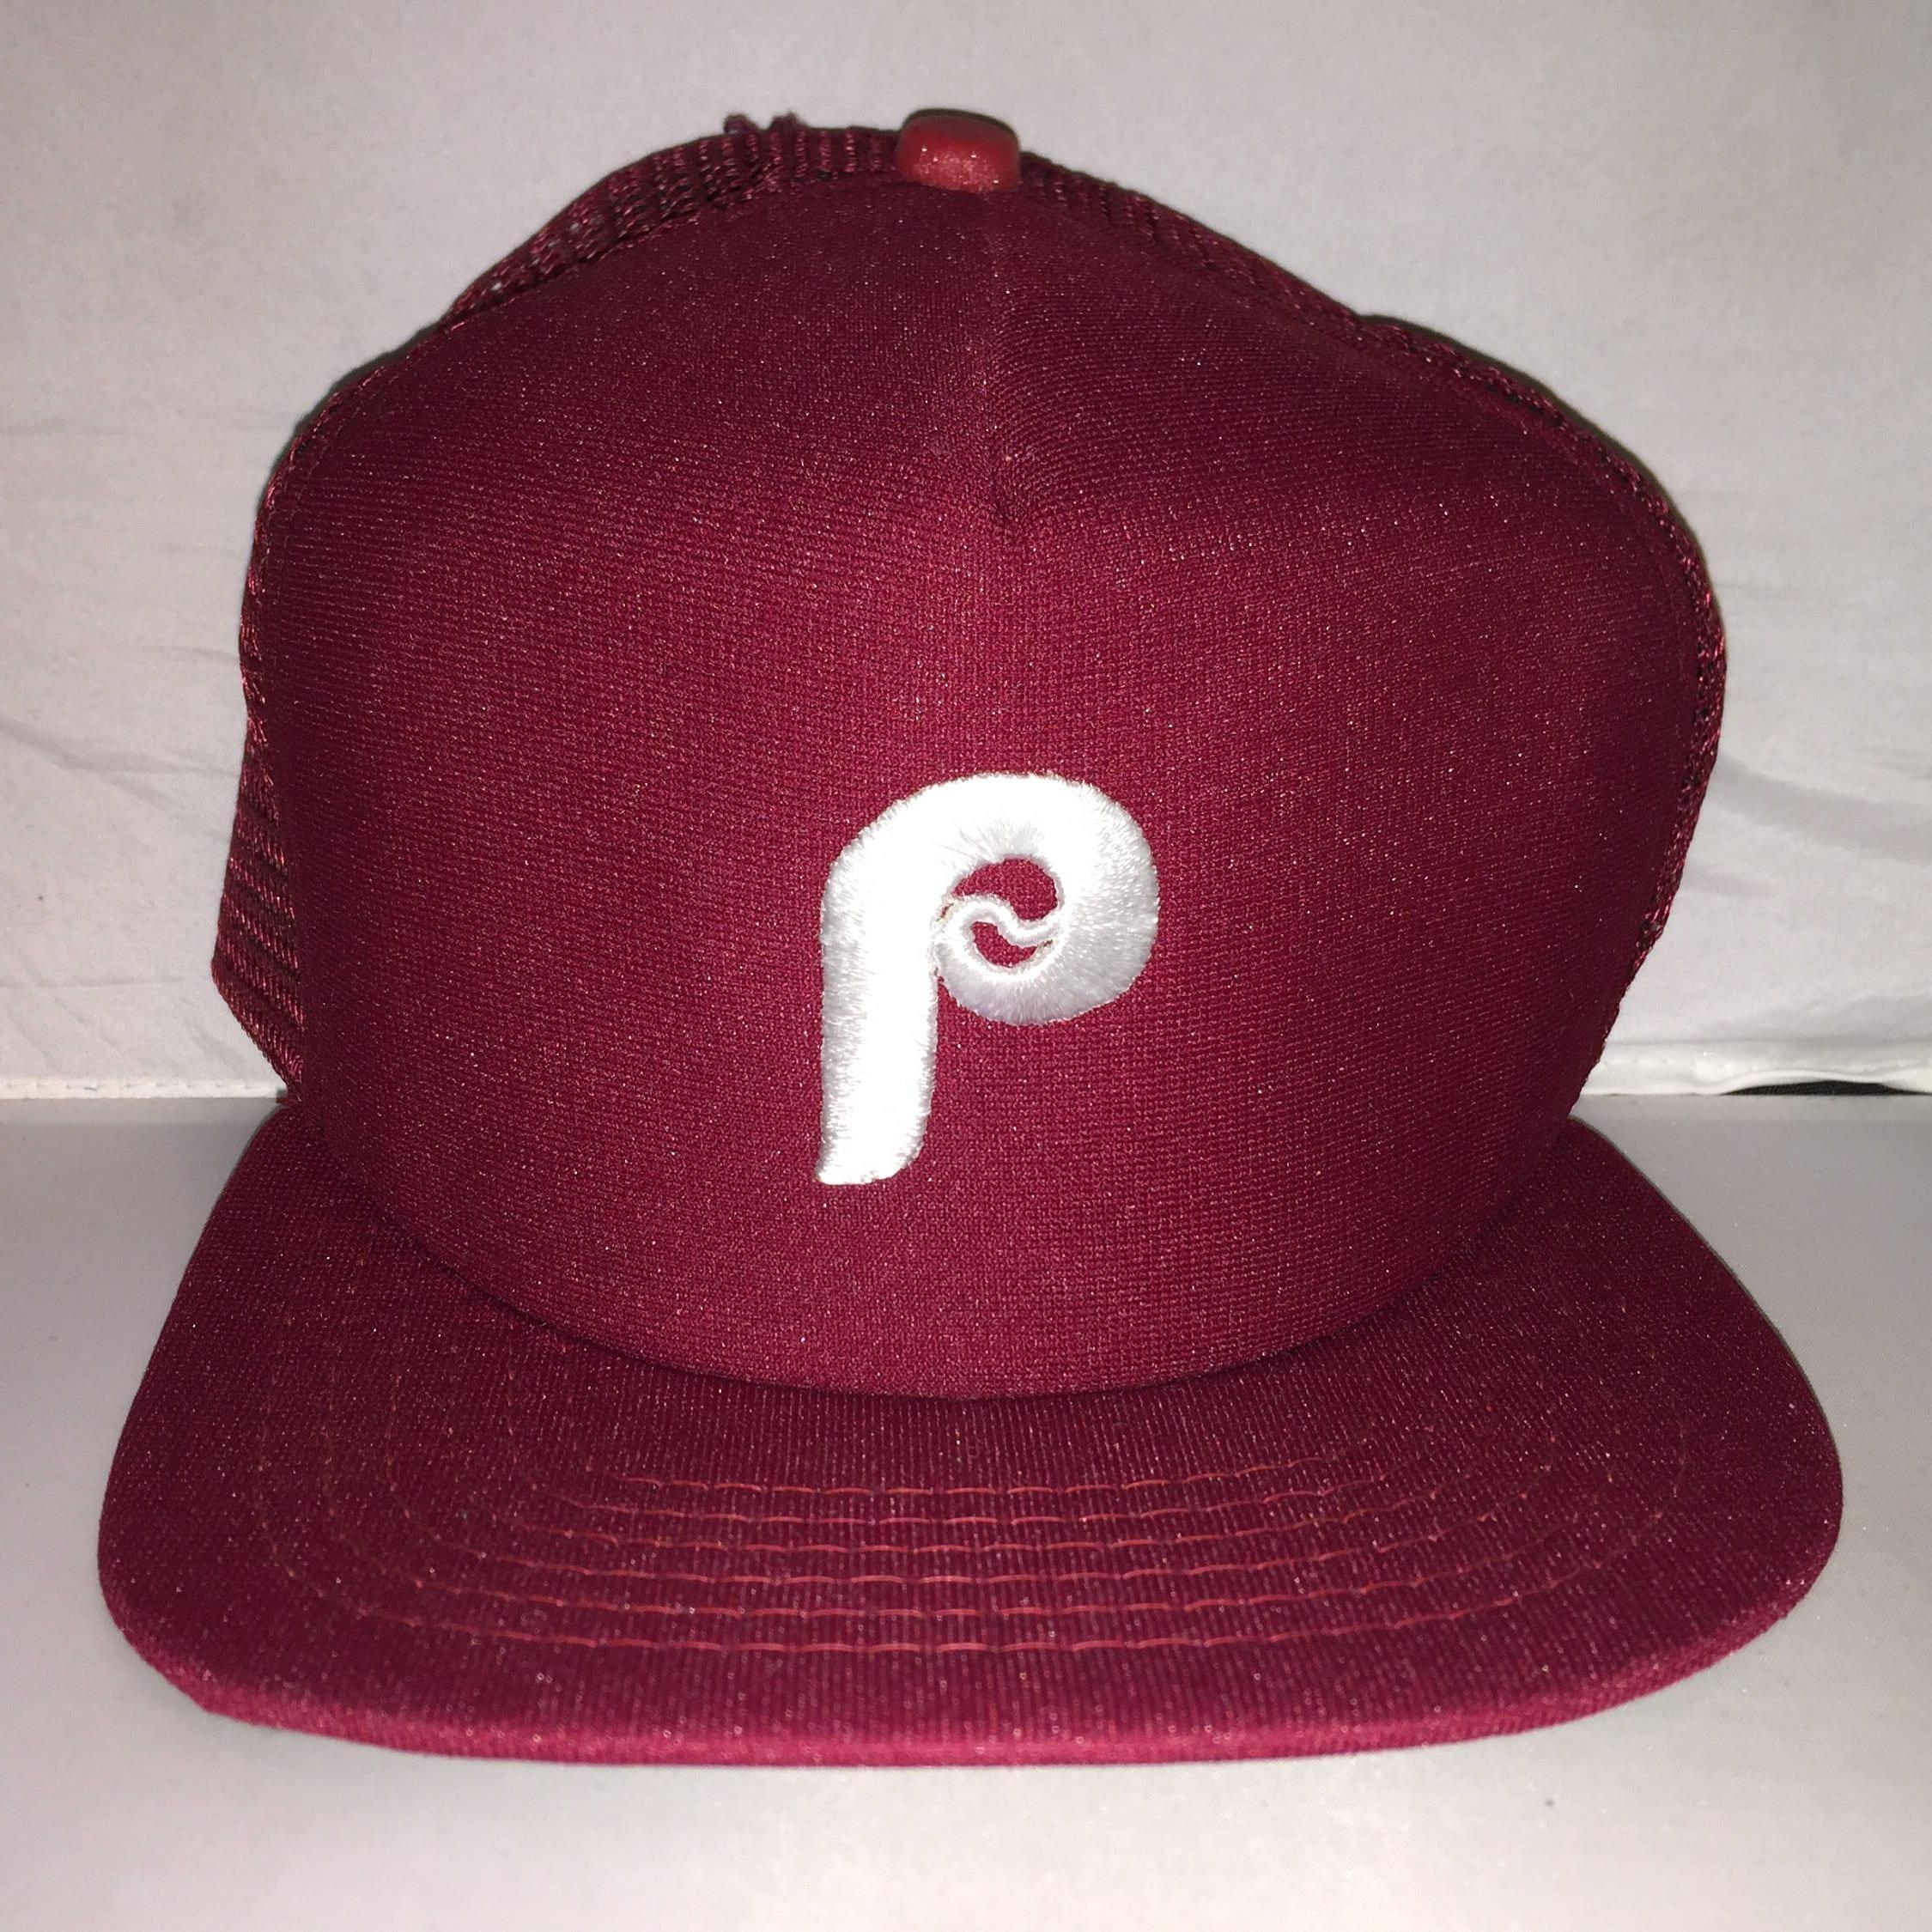 Vintage Philadelphia Phillies Snapback hat cap rare 80s 90s  b31d28ccc05